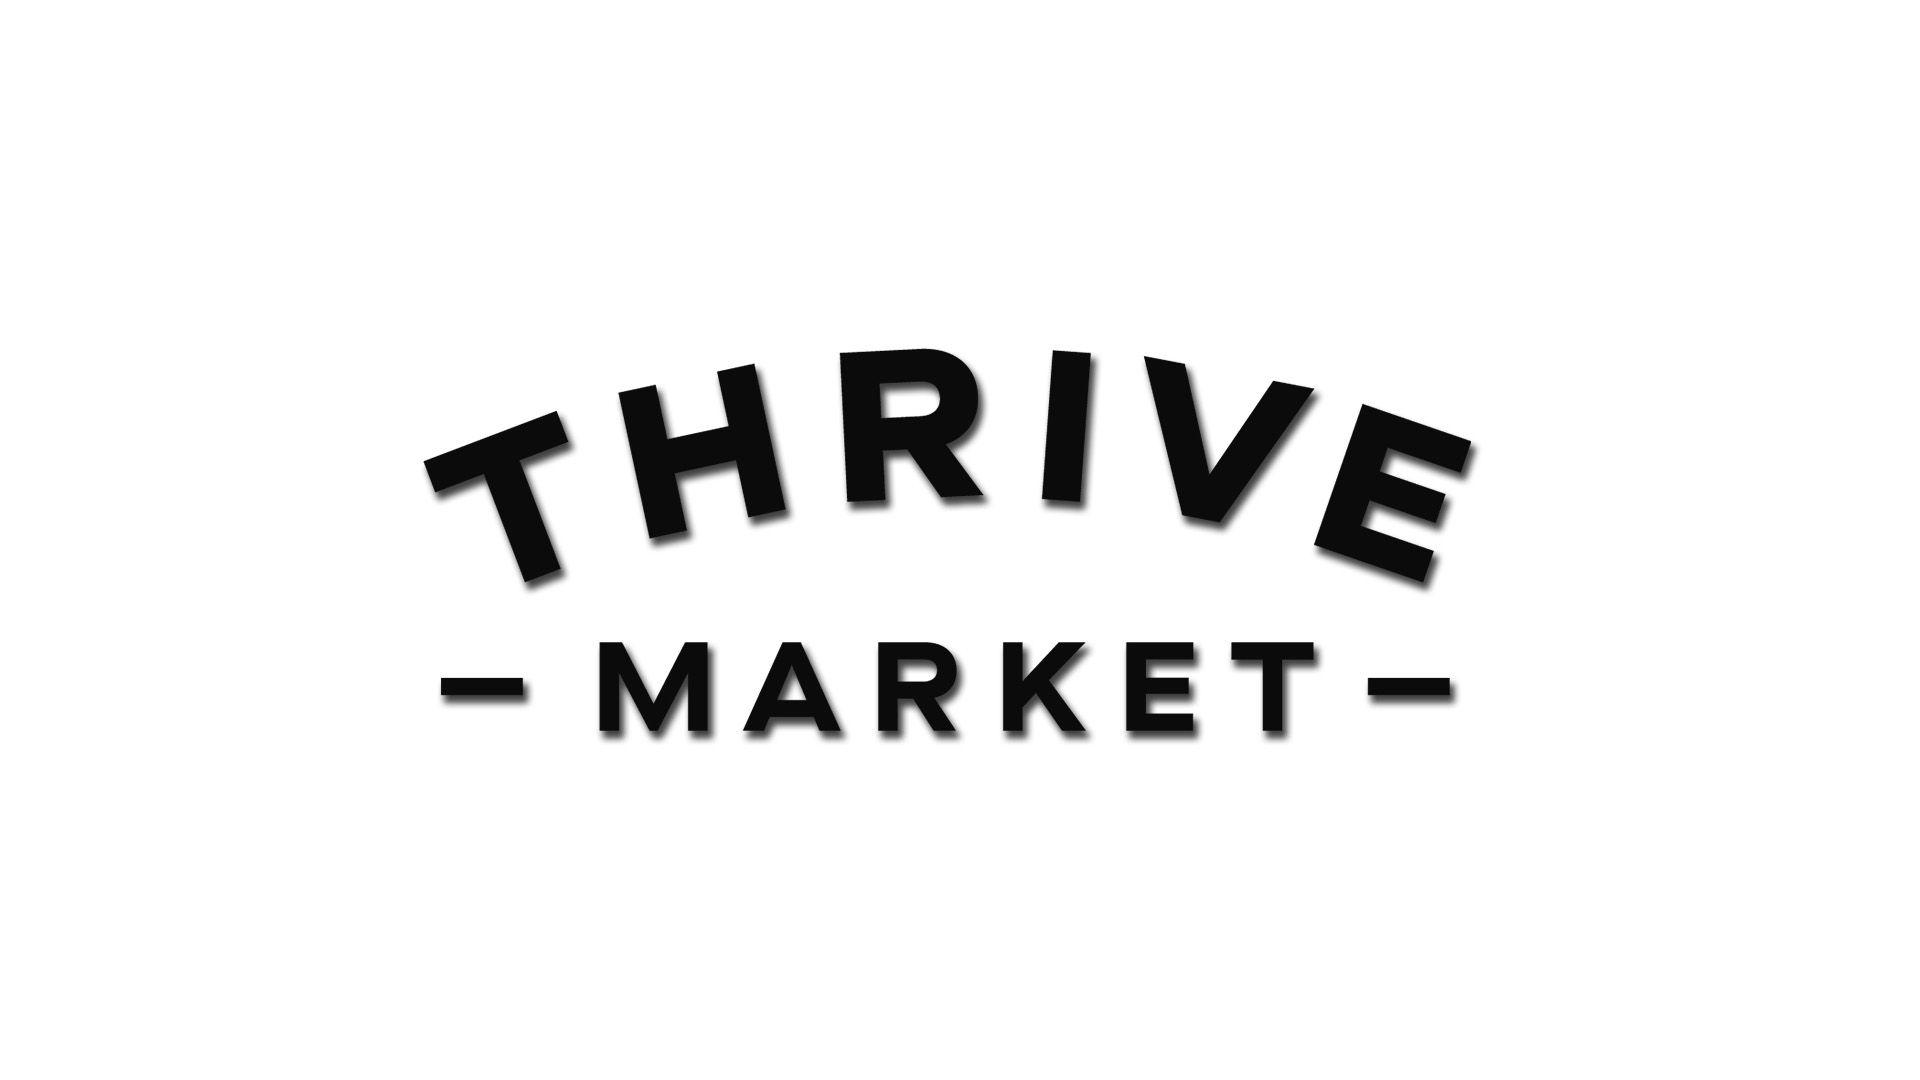 De 0 à 120 millions de dollars en 3 ans (Thrive Market) #GrowthHacking #WEbMarketing #FormationGrowthHacking #CentreDeFormationFrance #TunnelAARRR #AARRR #SocialMedia #CommunityManagement #SEO #ThriveMarket #Acquisition